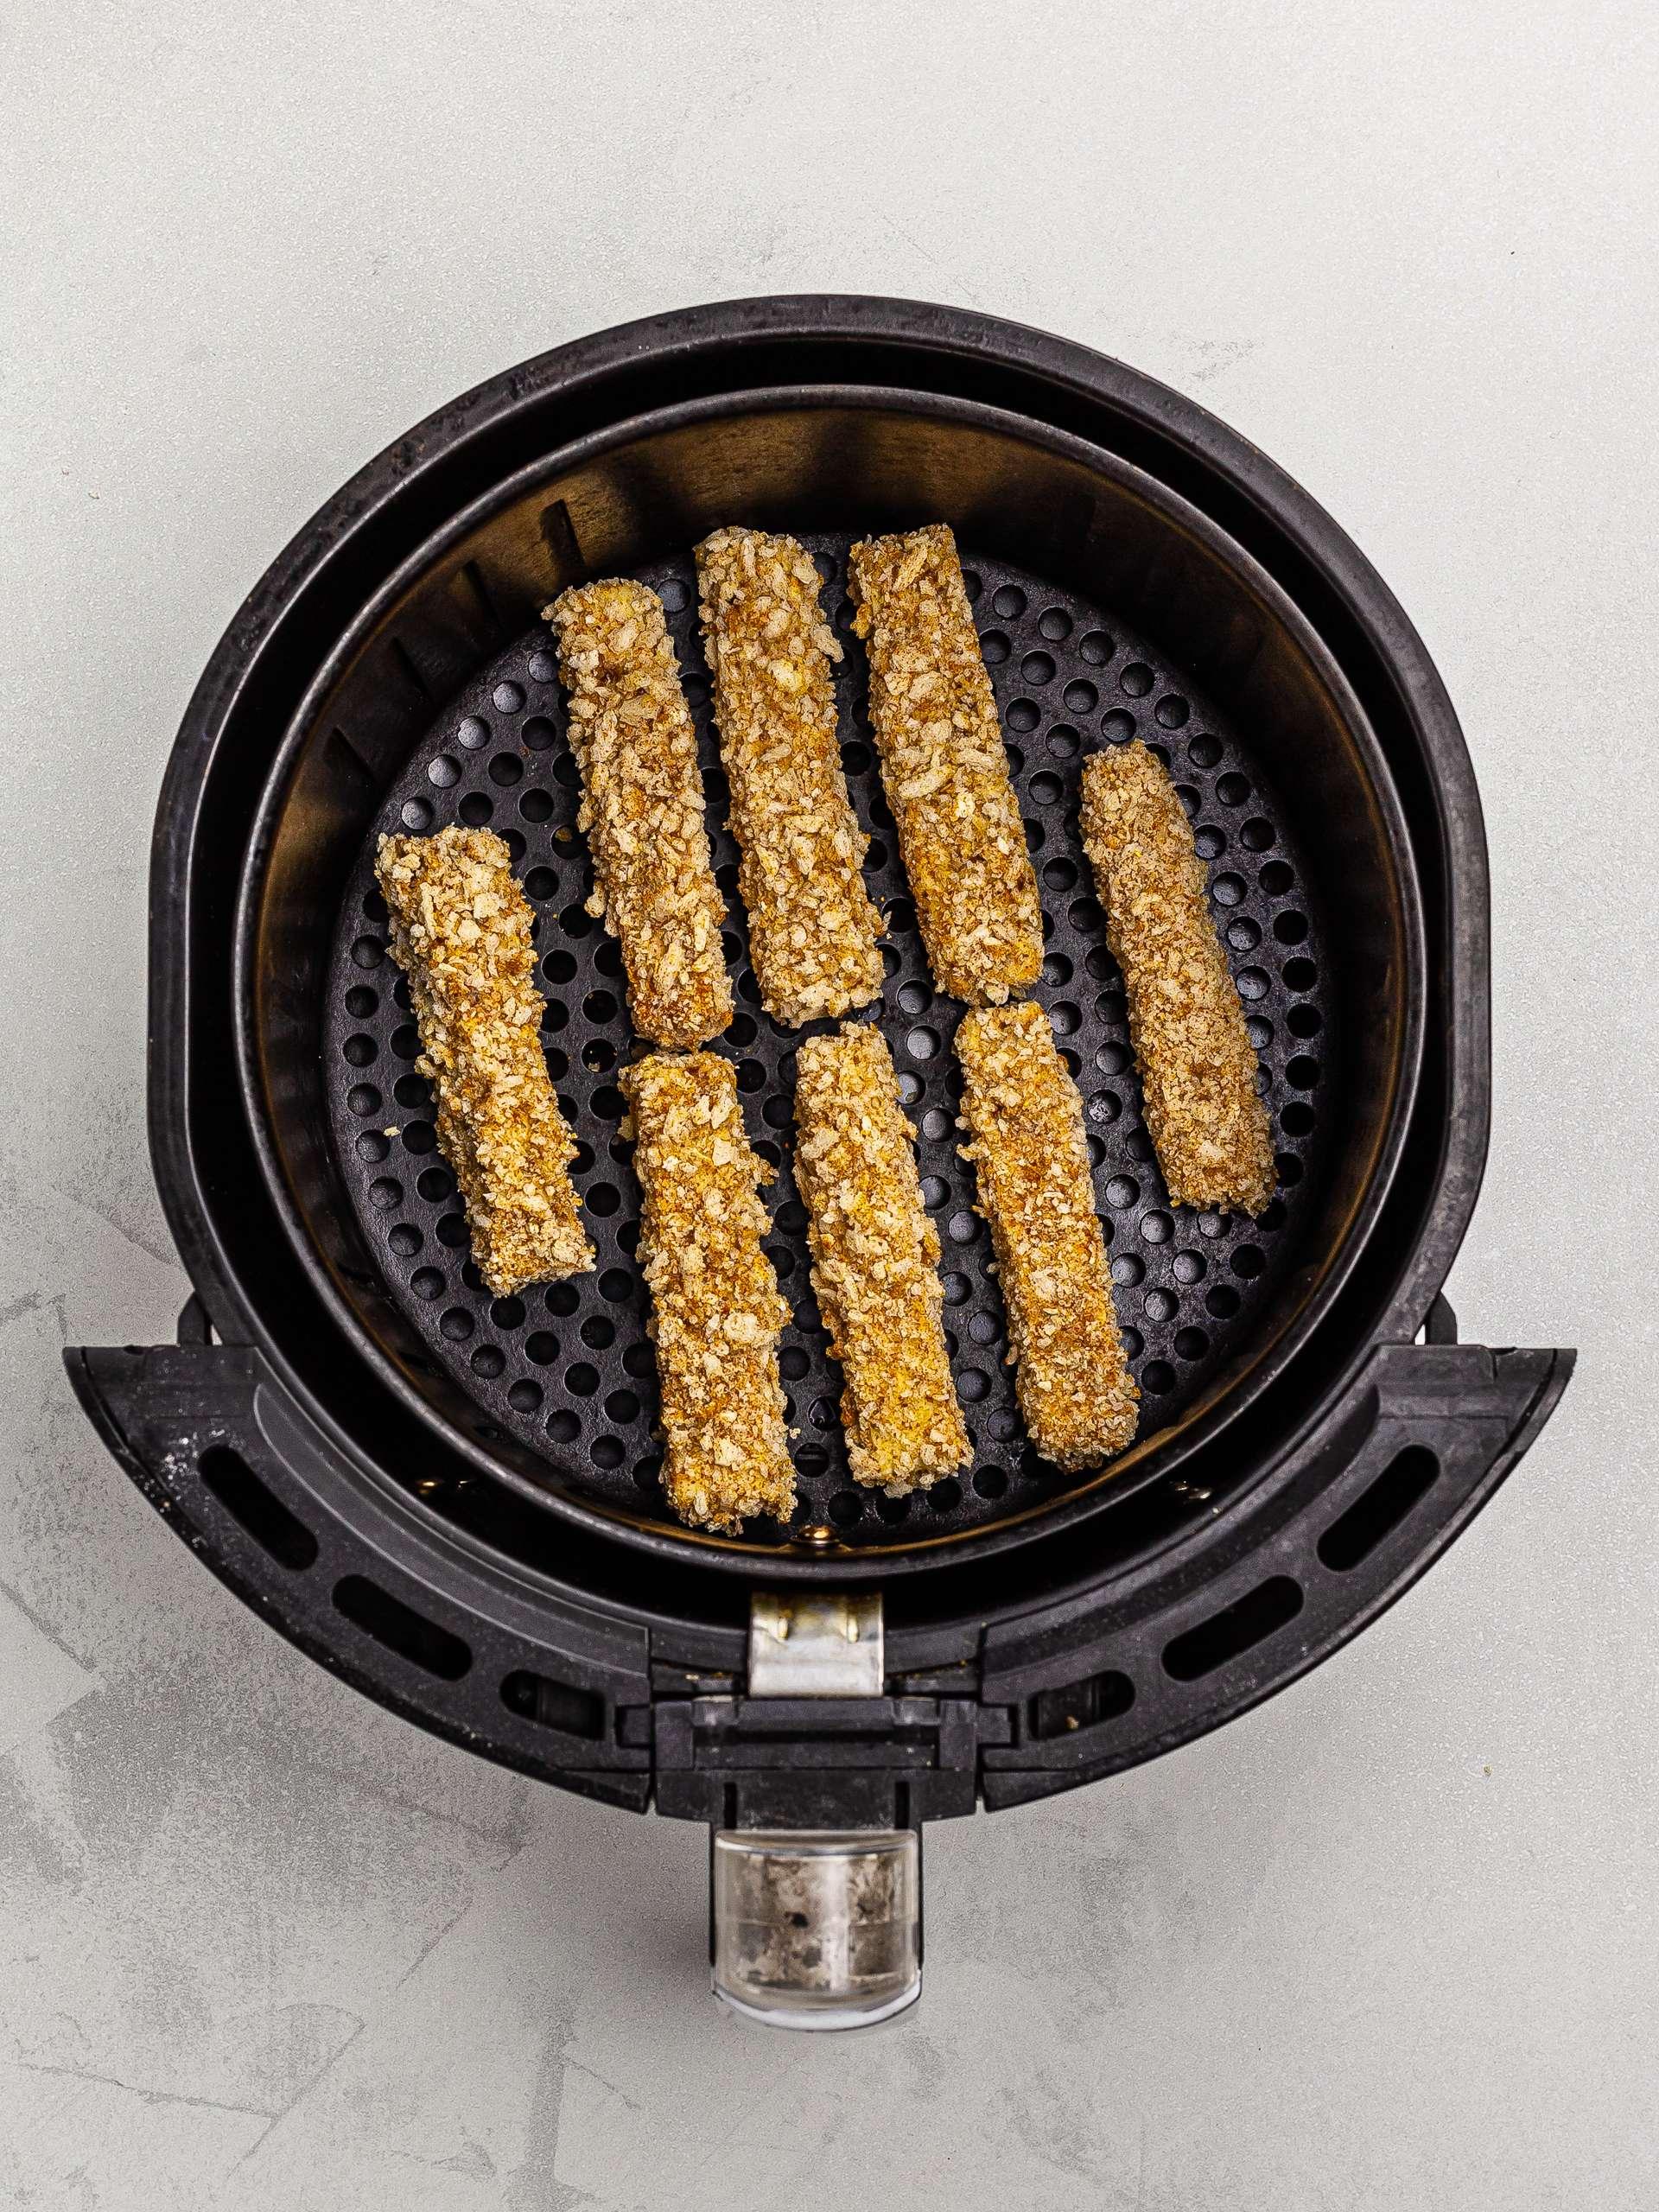 eggplant fries in the air fryer basket